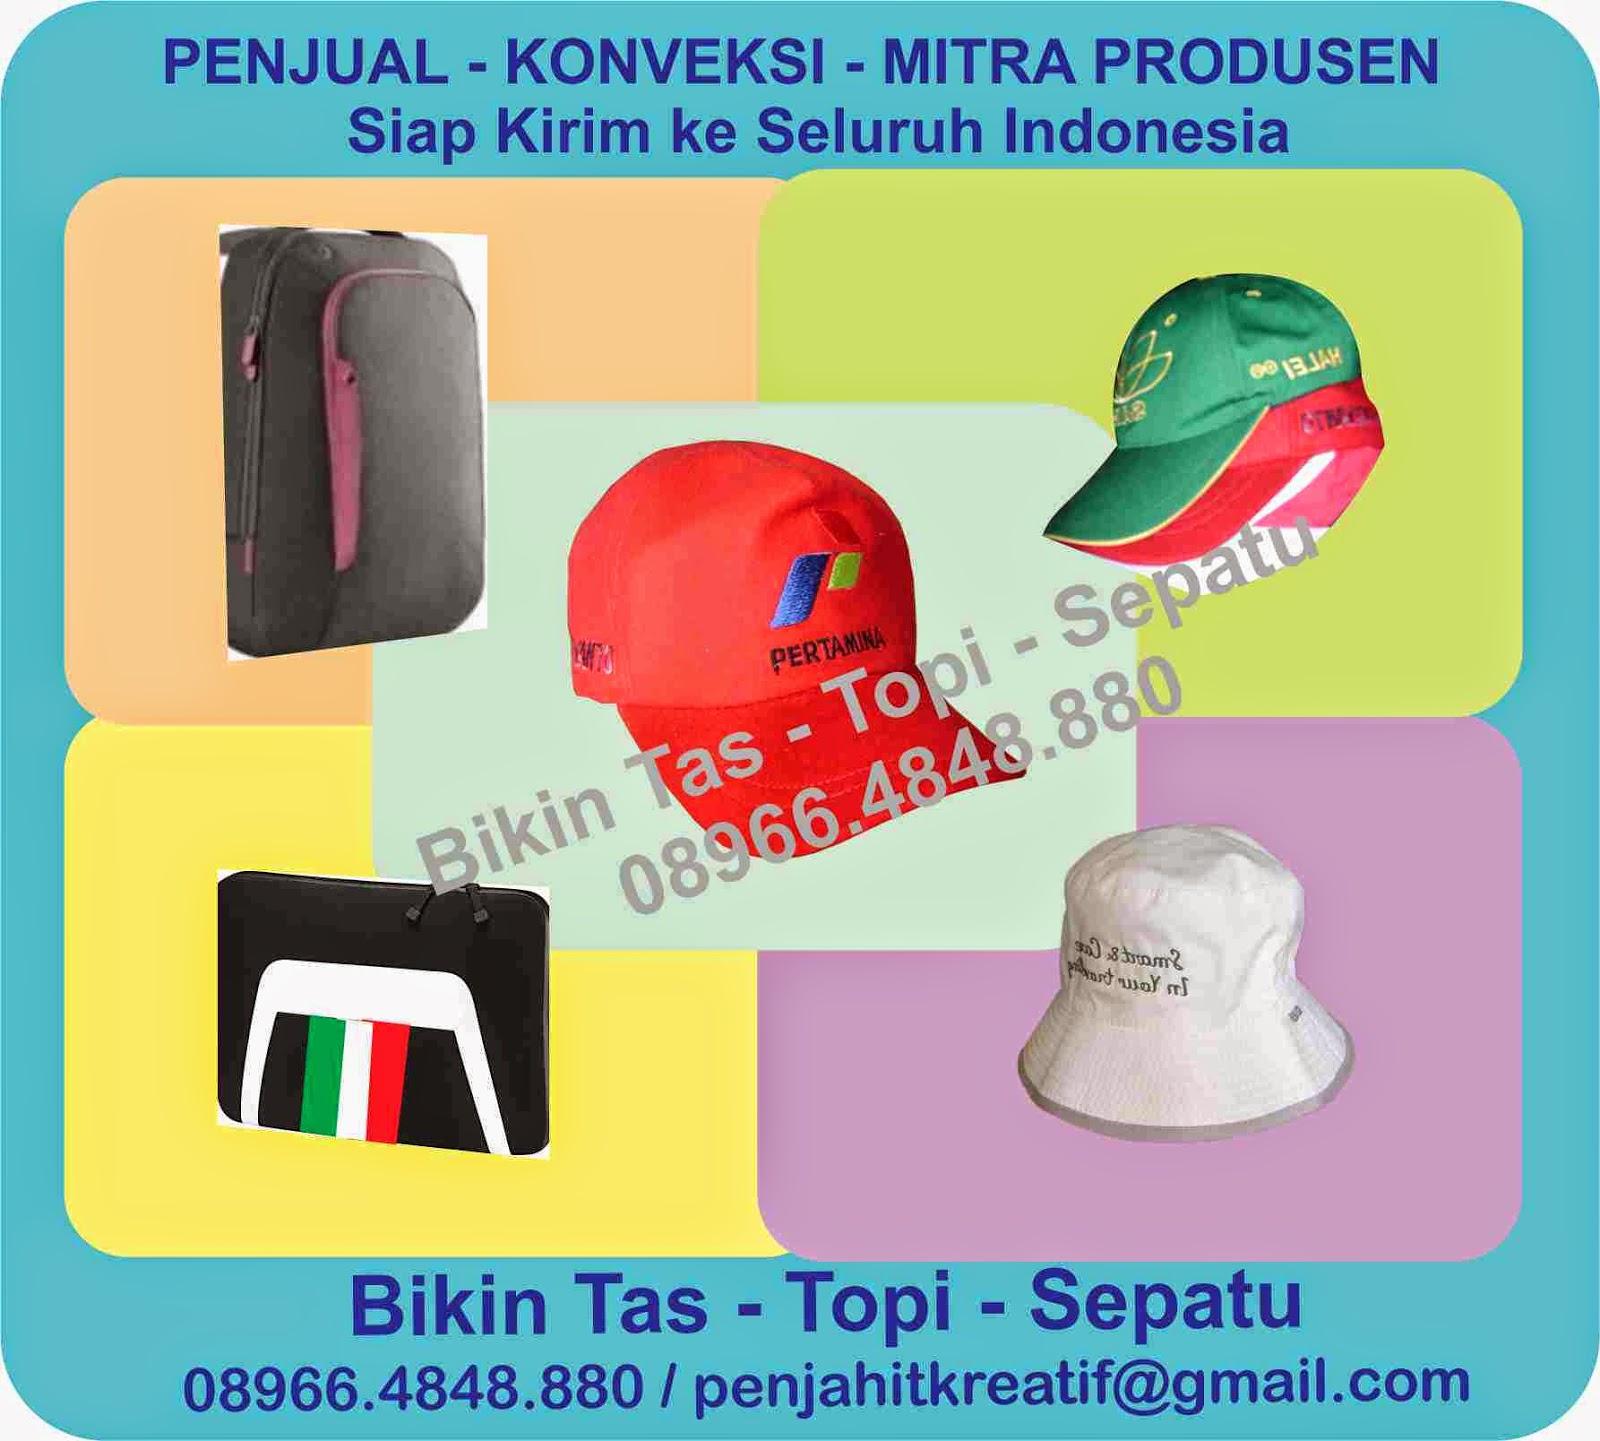 Pesan Tas Promosi - Topi promosi di Surabaya - 089664848880